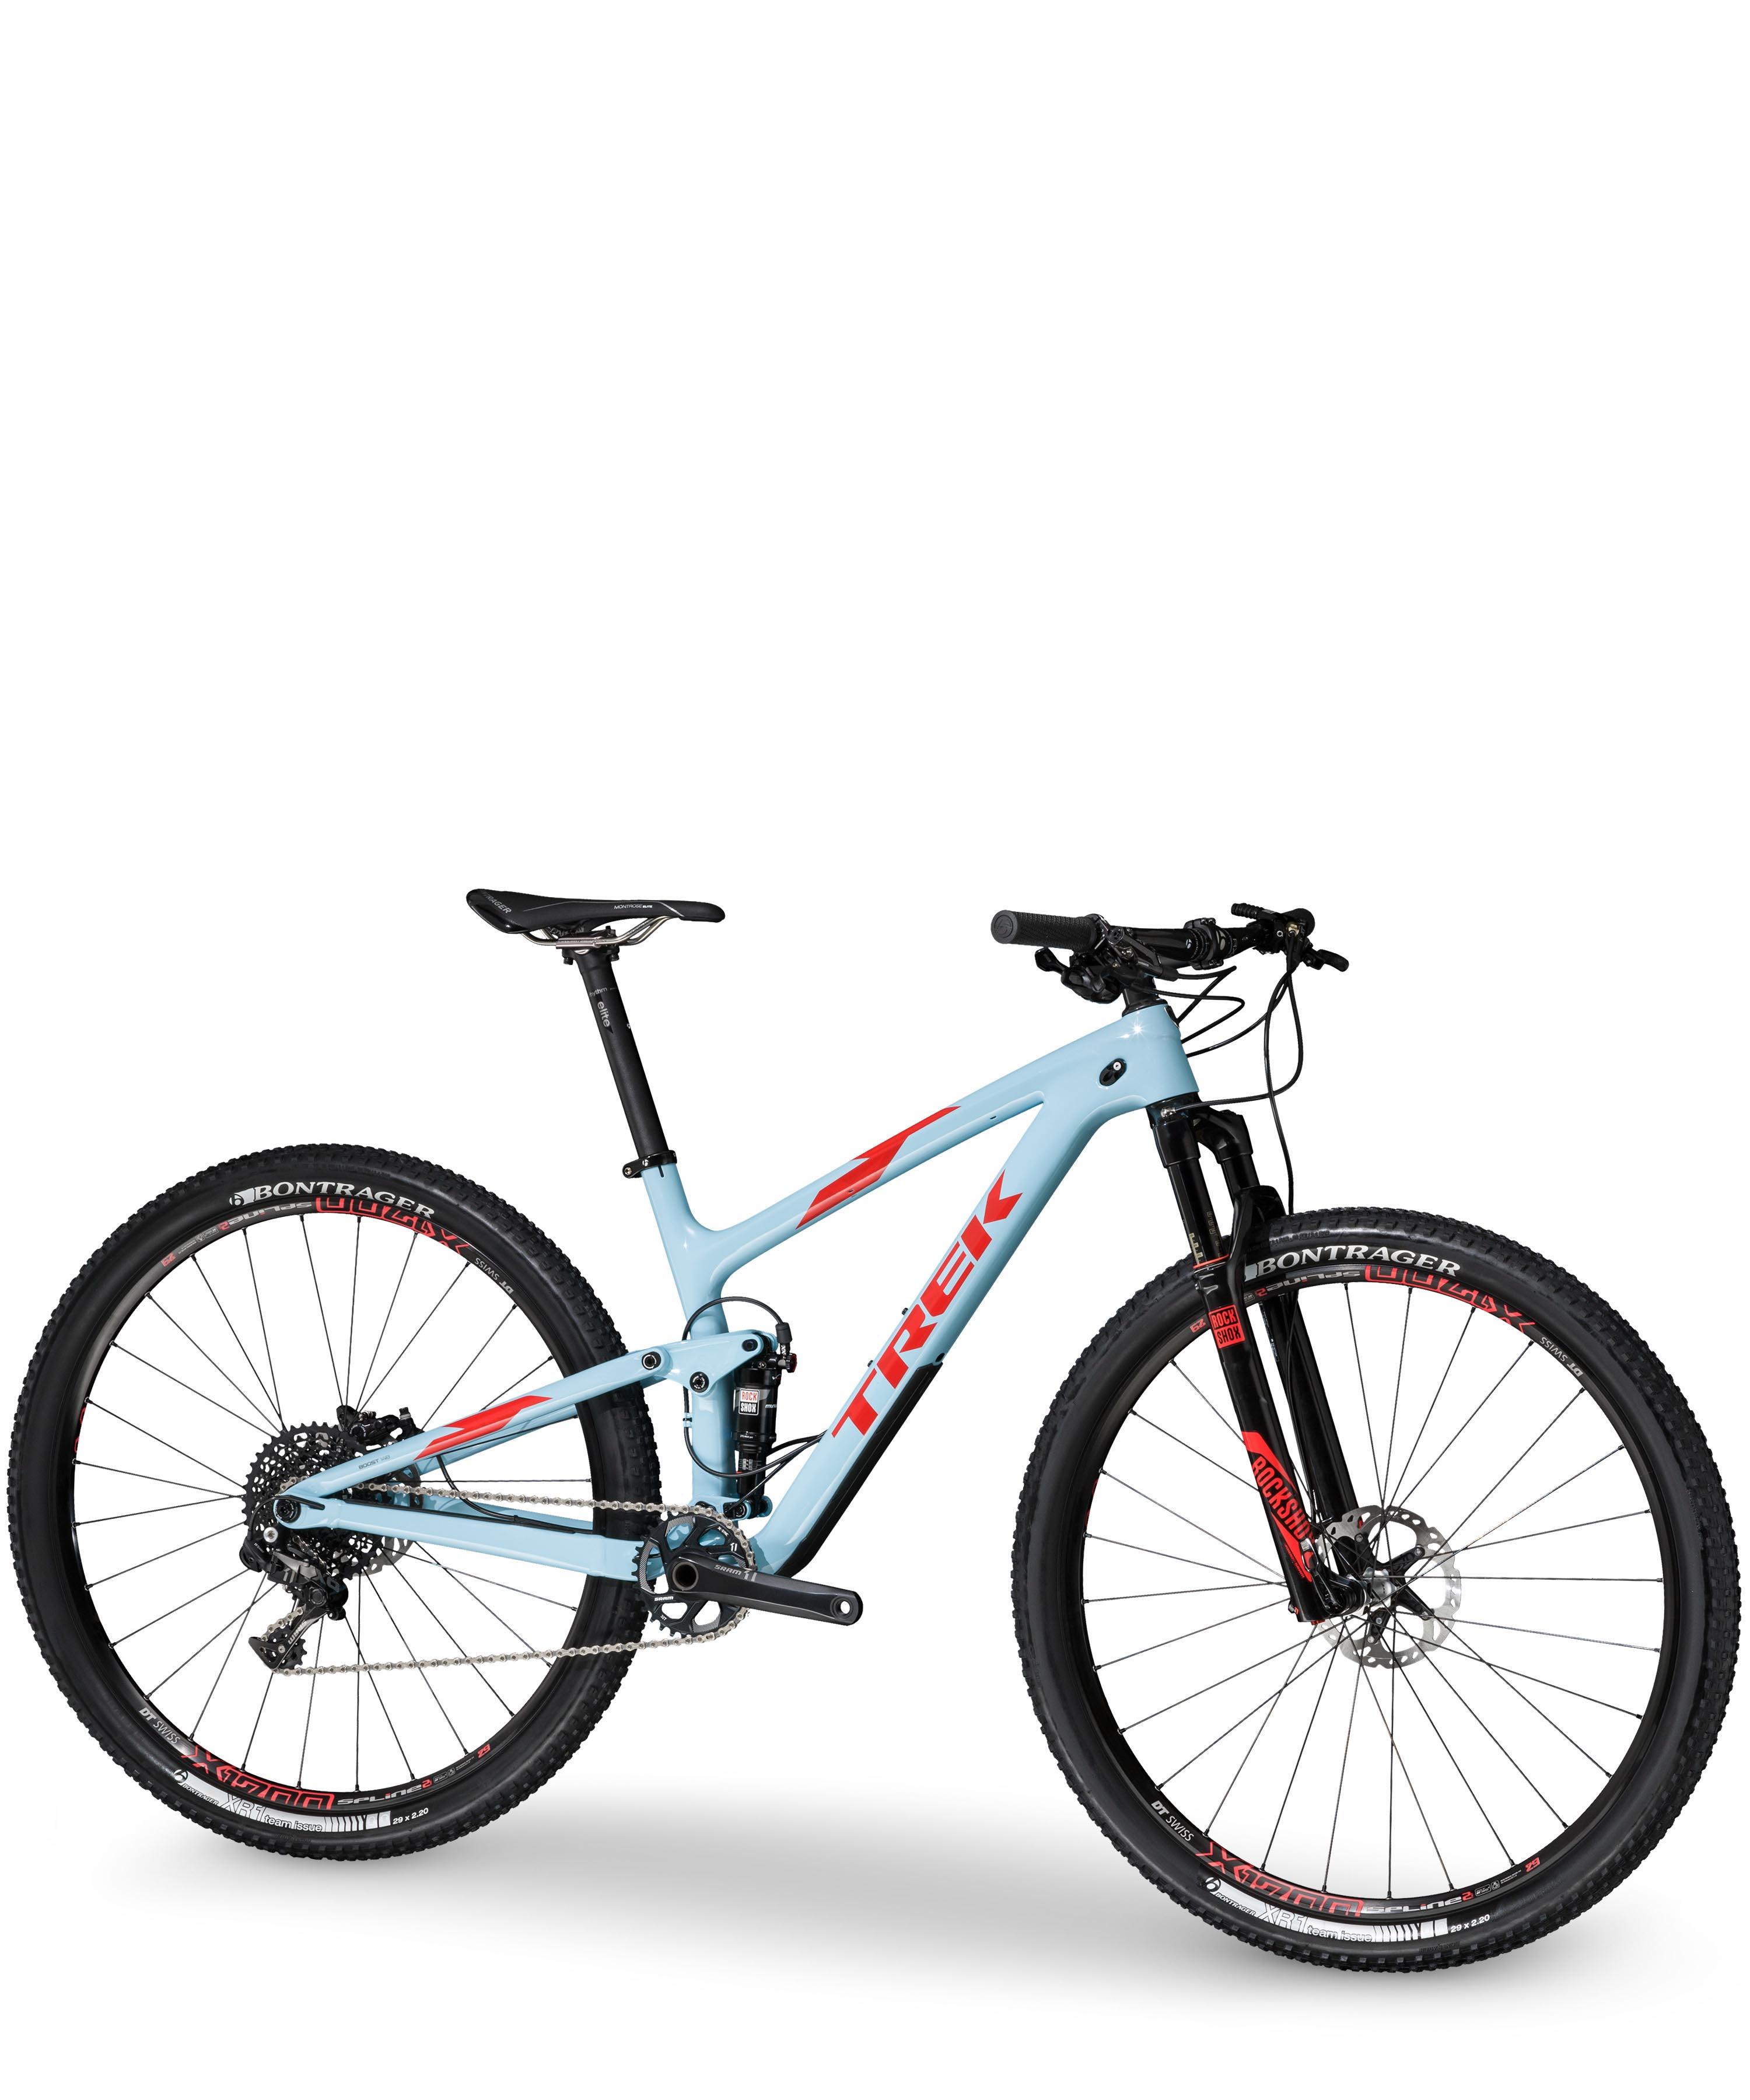 MTB-MAG COM - Mountain Bike Magazine | Trek unveils all-new